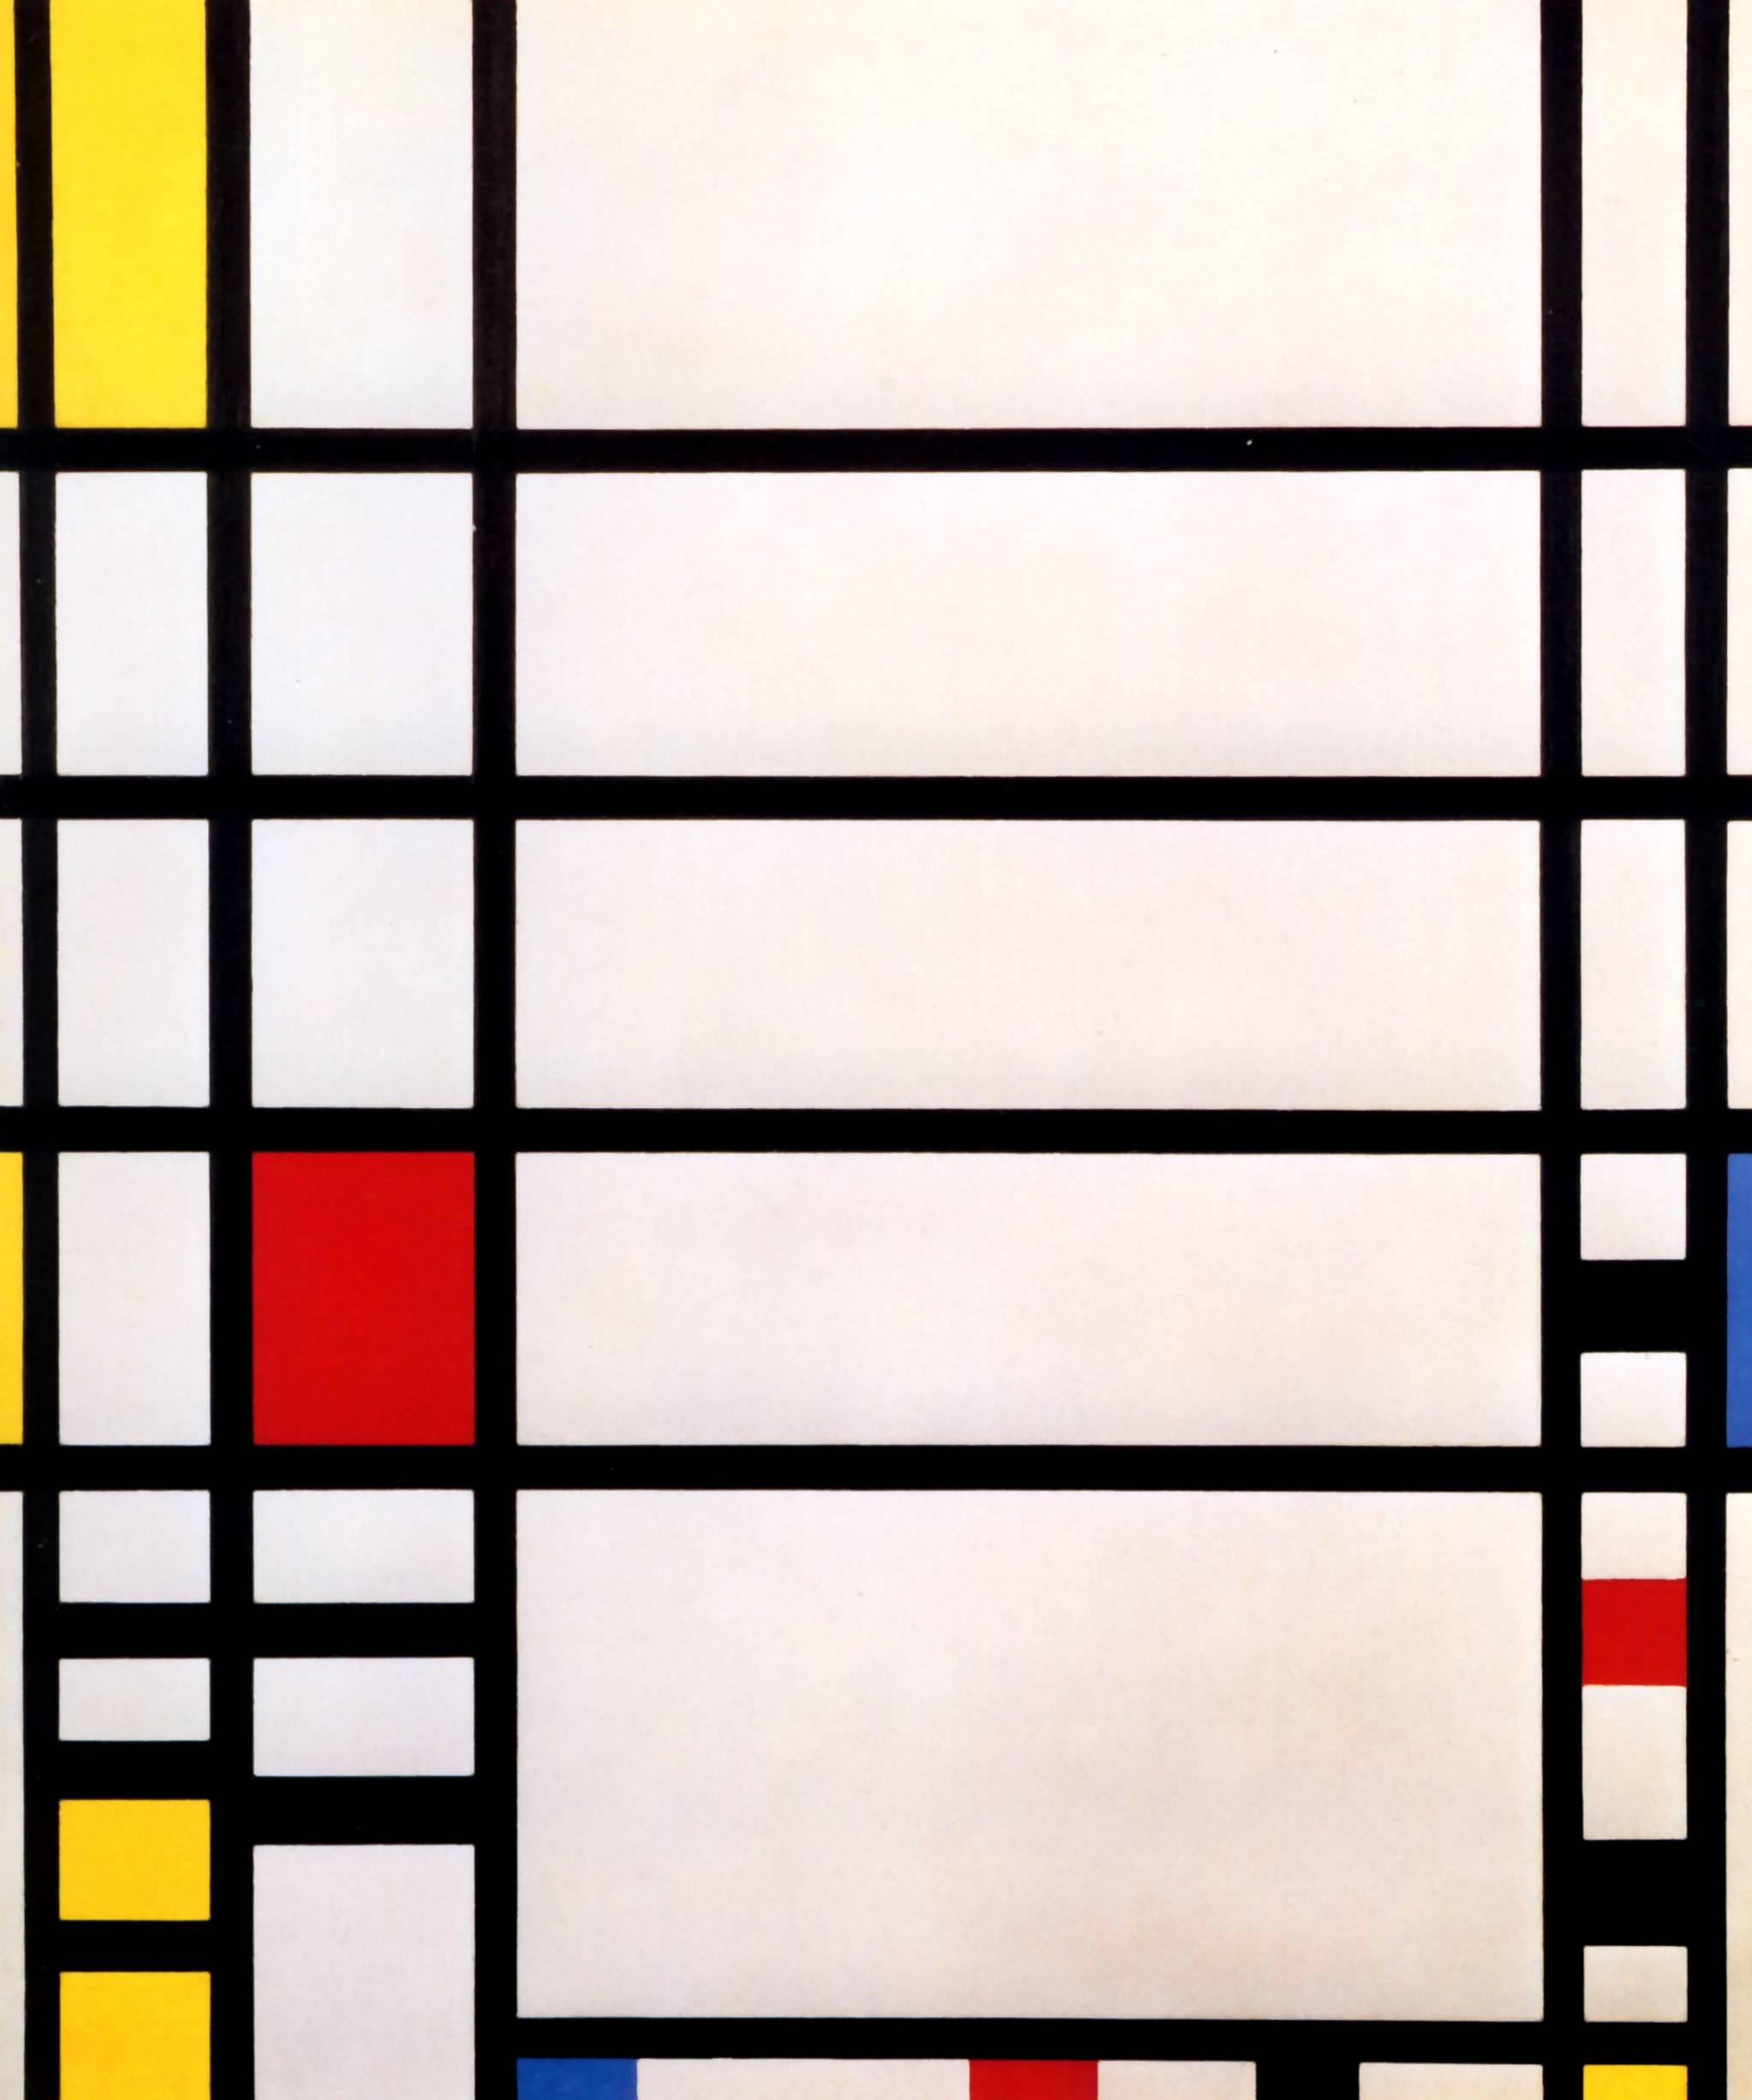 piet mondrian Mondrian's house of birth in amersfoort, now museum of constructive and concrete art.